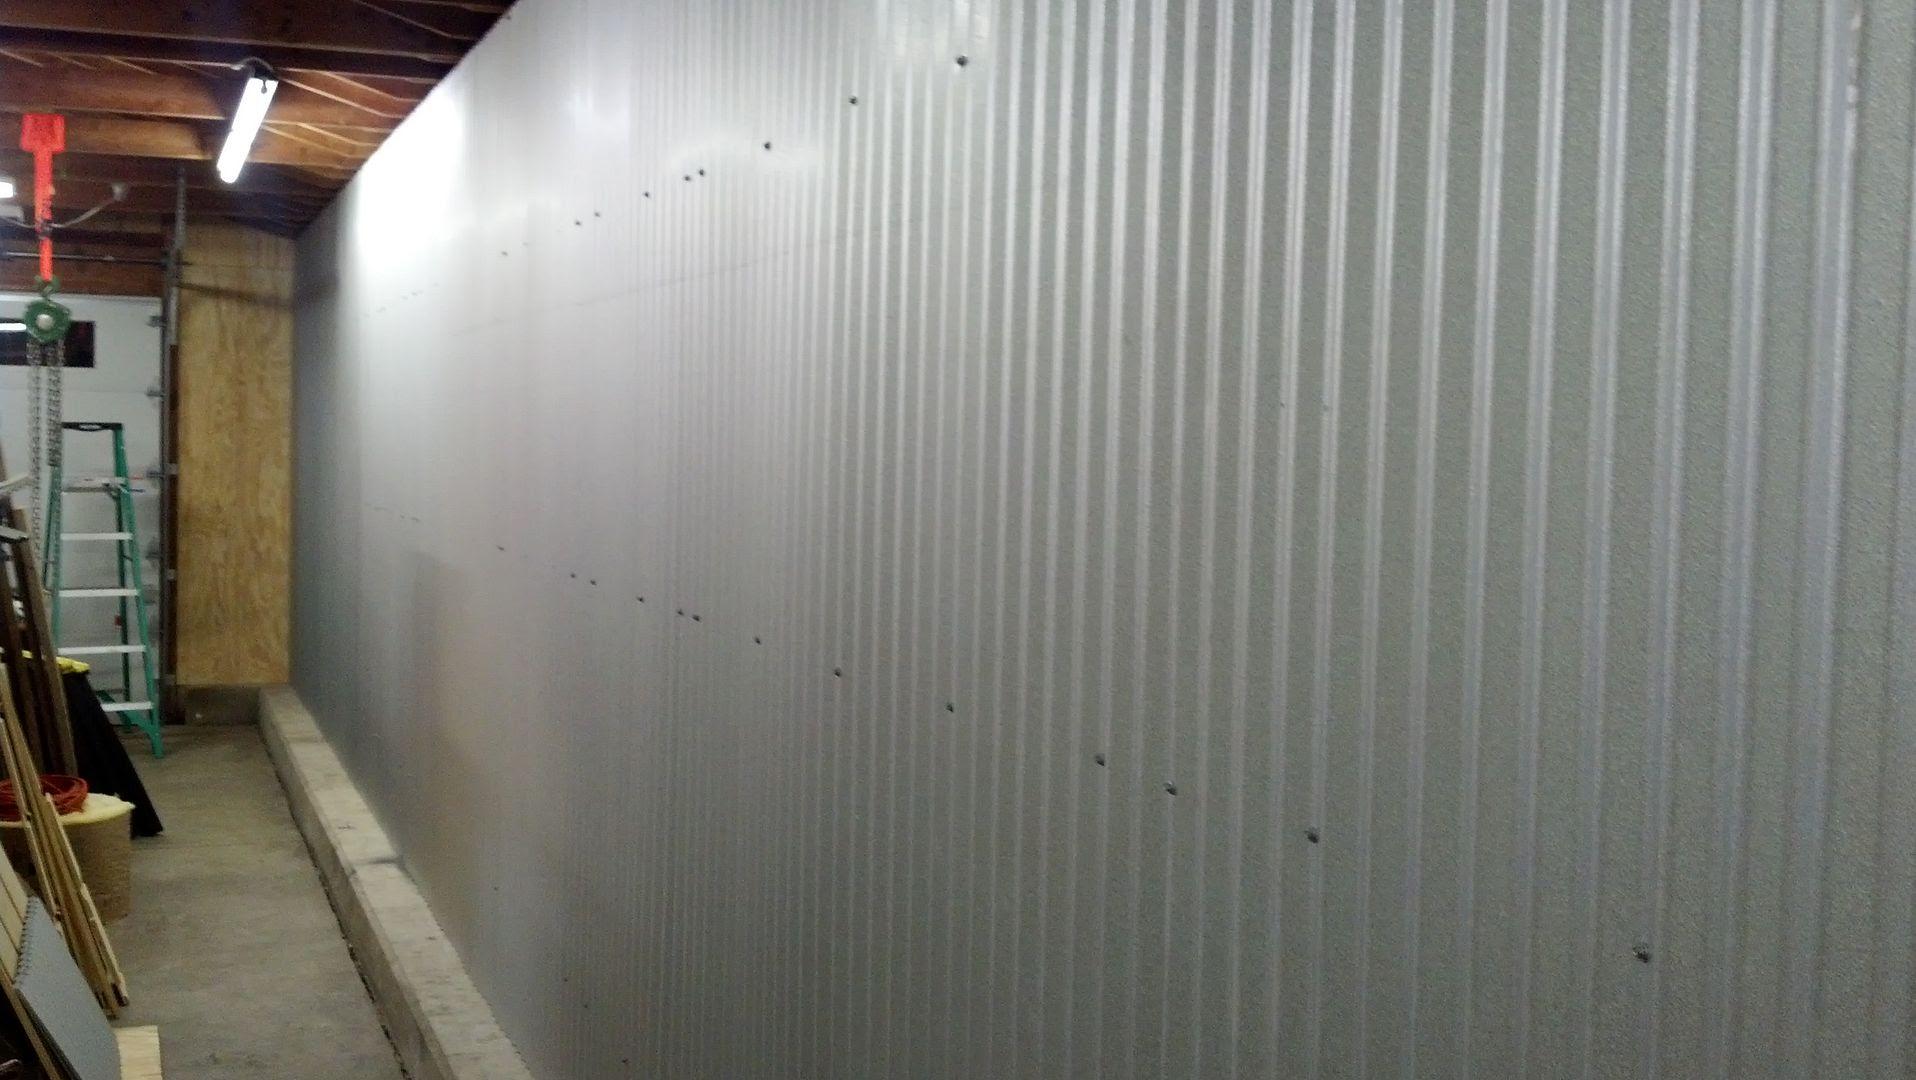 Garage Wall Covering Not Drywall Edition Grassroots Motorsports